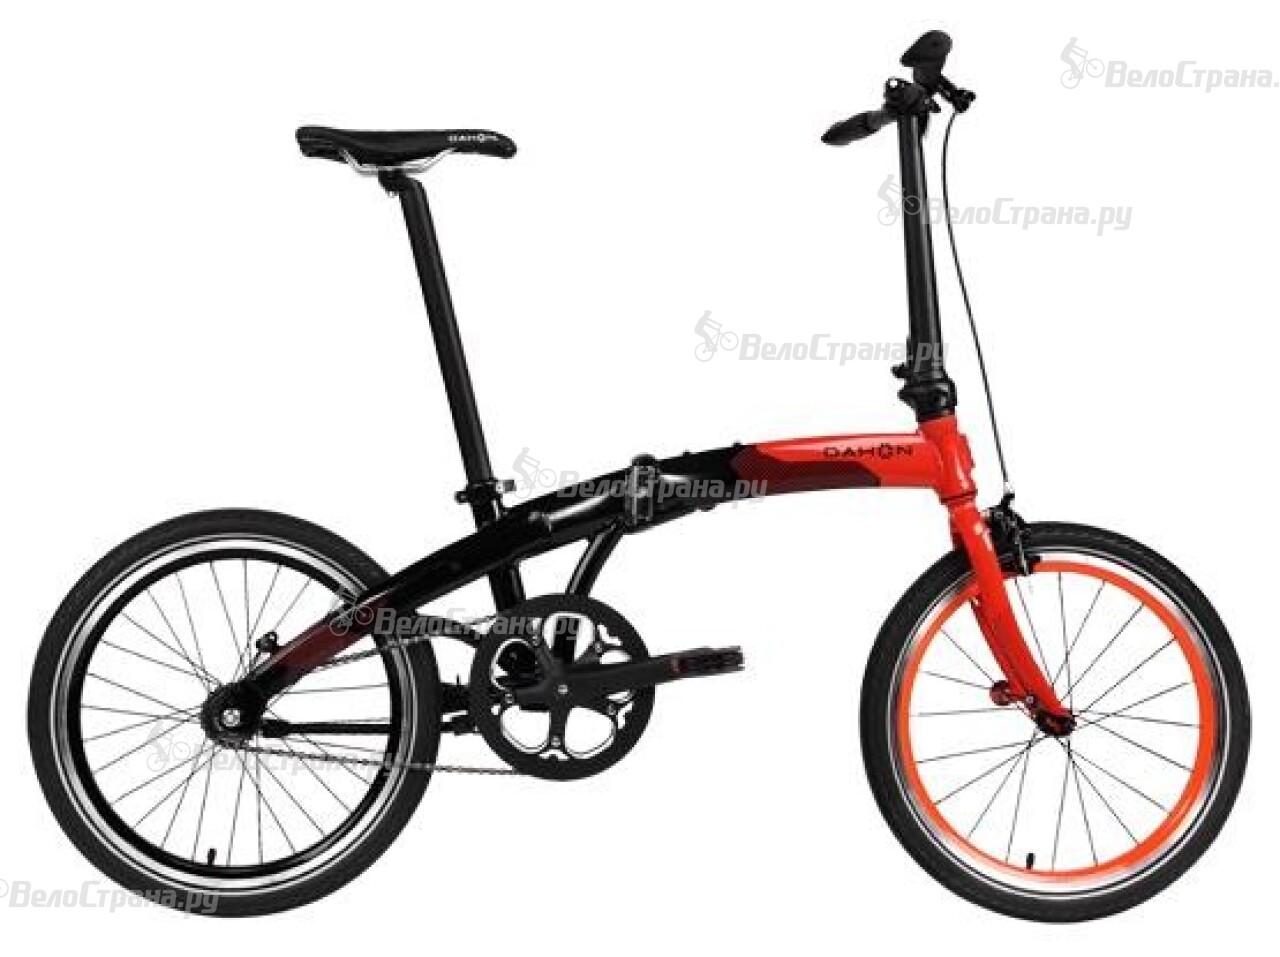 Велосипед Dahon Mu Uno (2014) велосипед dahon speed d7 2014